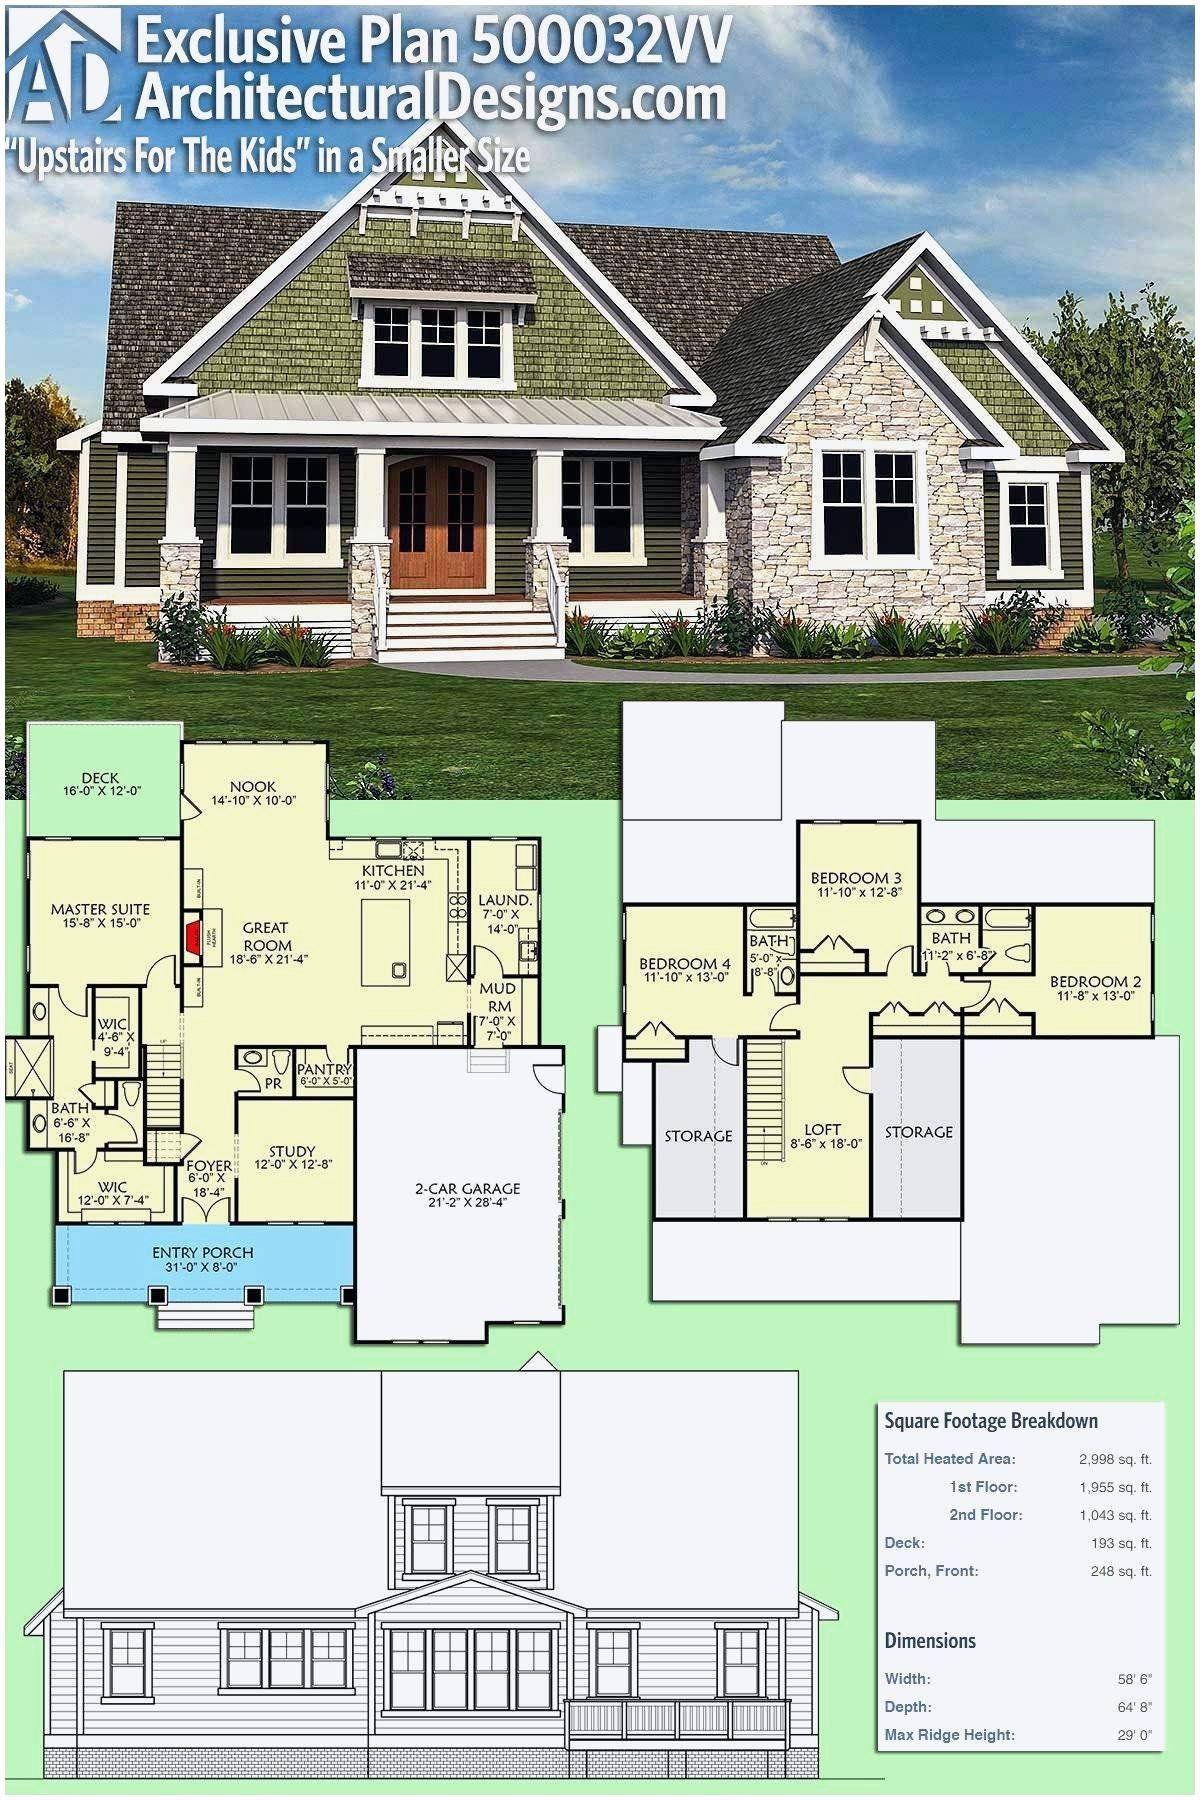 8 Sided House Plans Lovely 8 Sided Log Cabin The Log Home Neighborhood Islaminjapanmedia Org In 2020 House Plans With Pictures Luxury House Plans House Plans